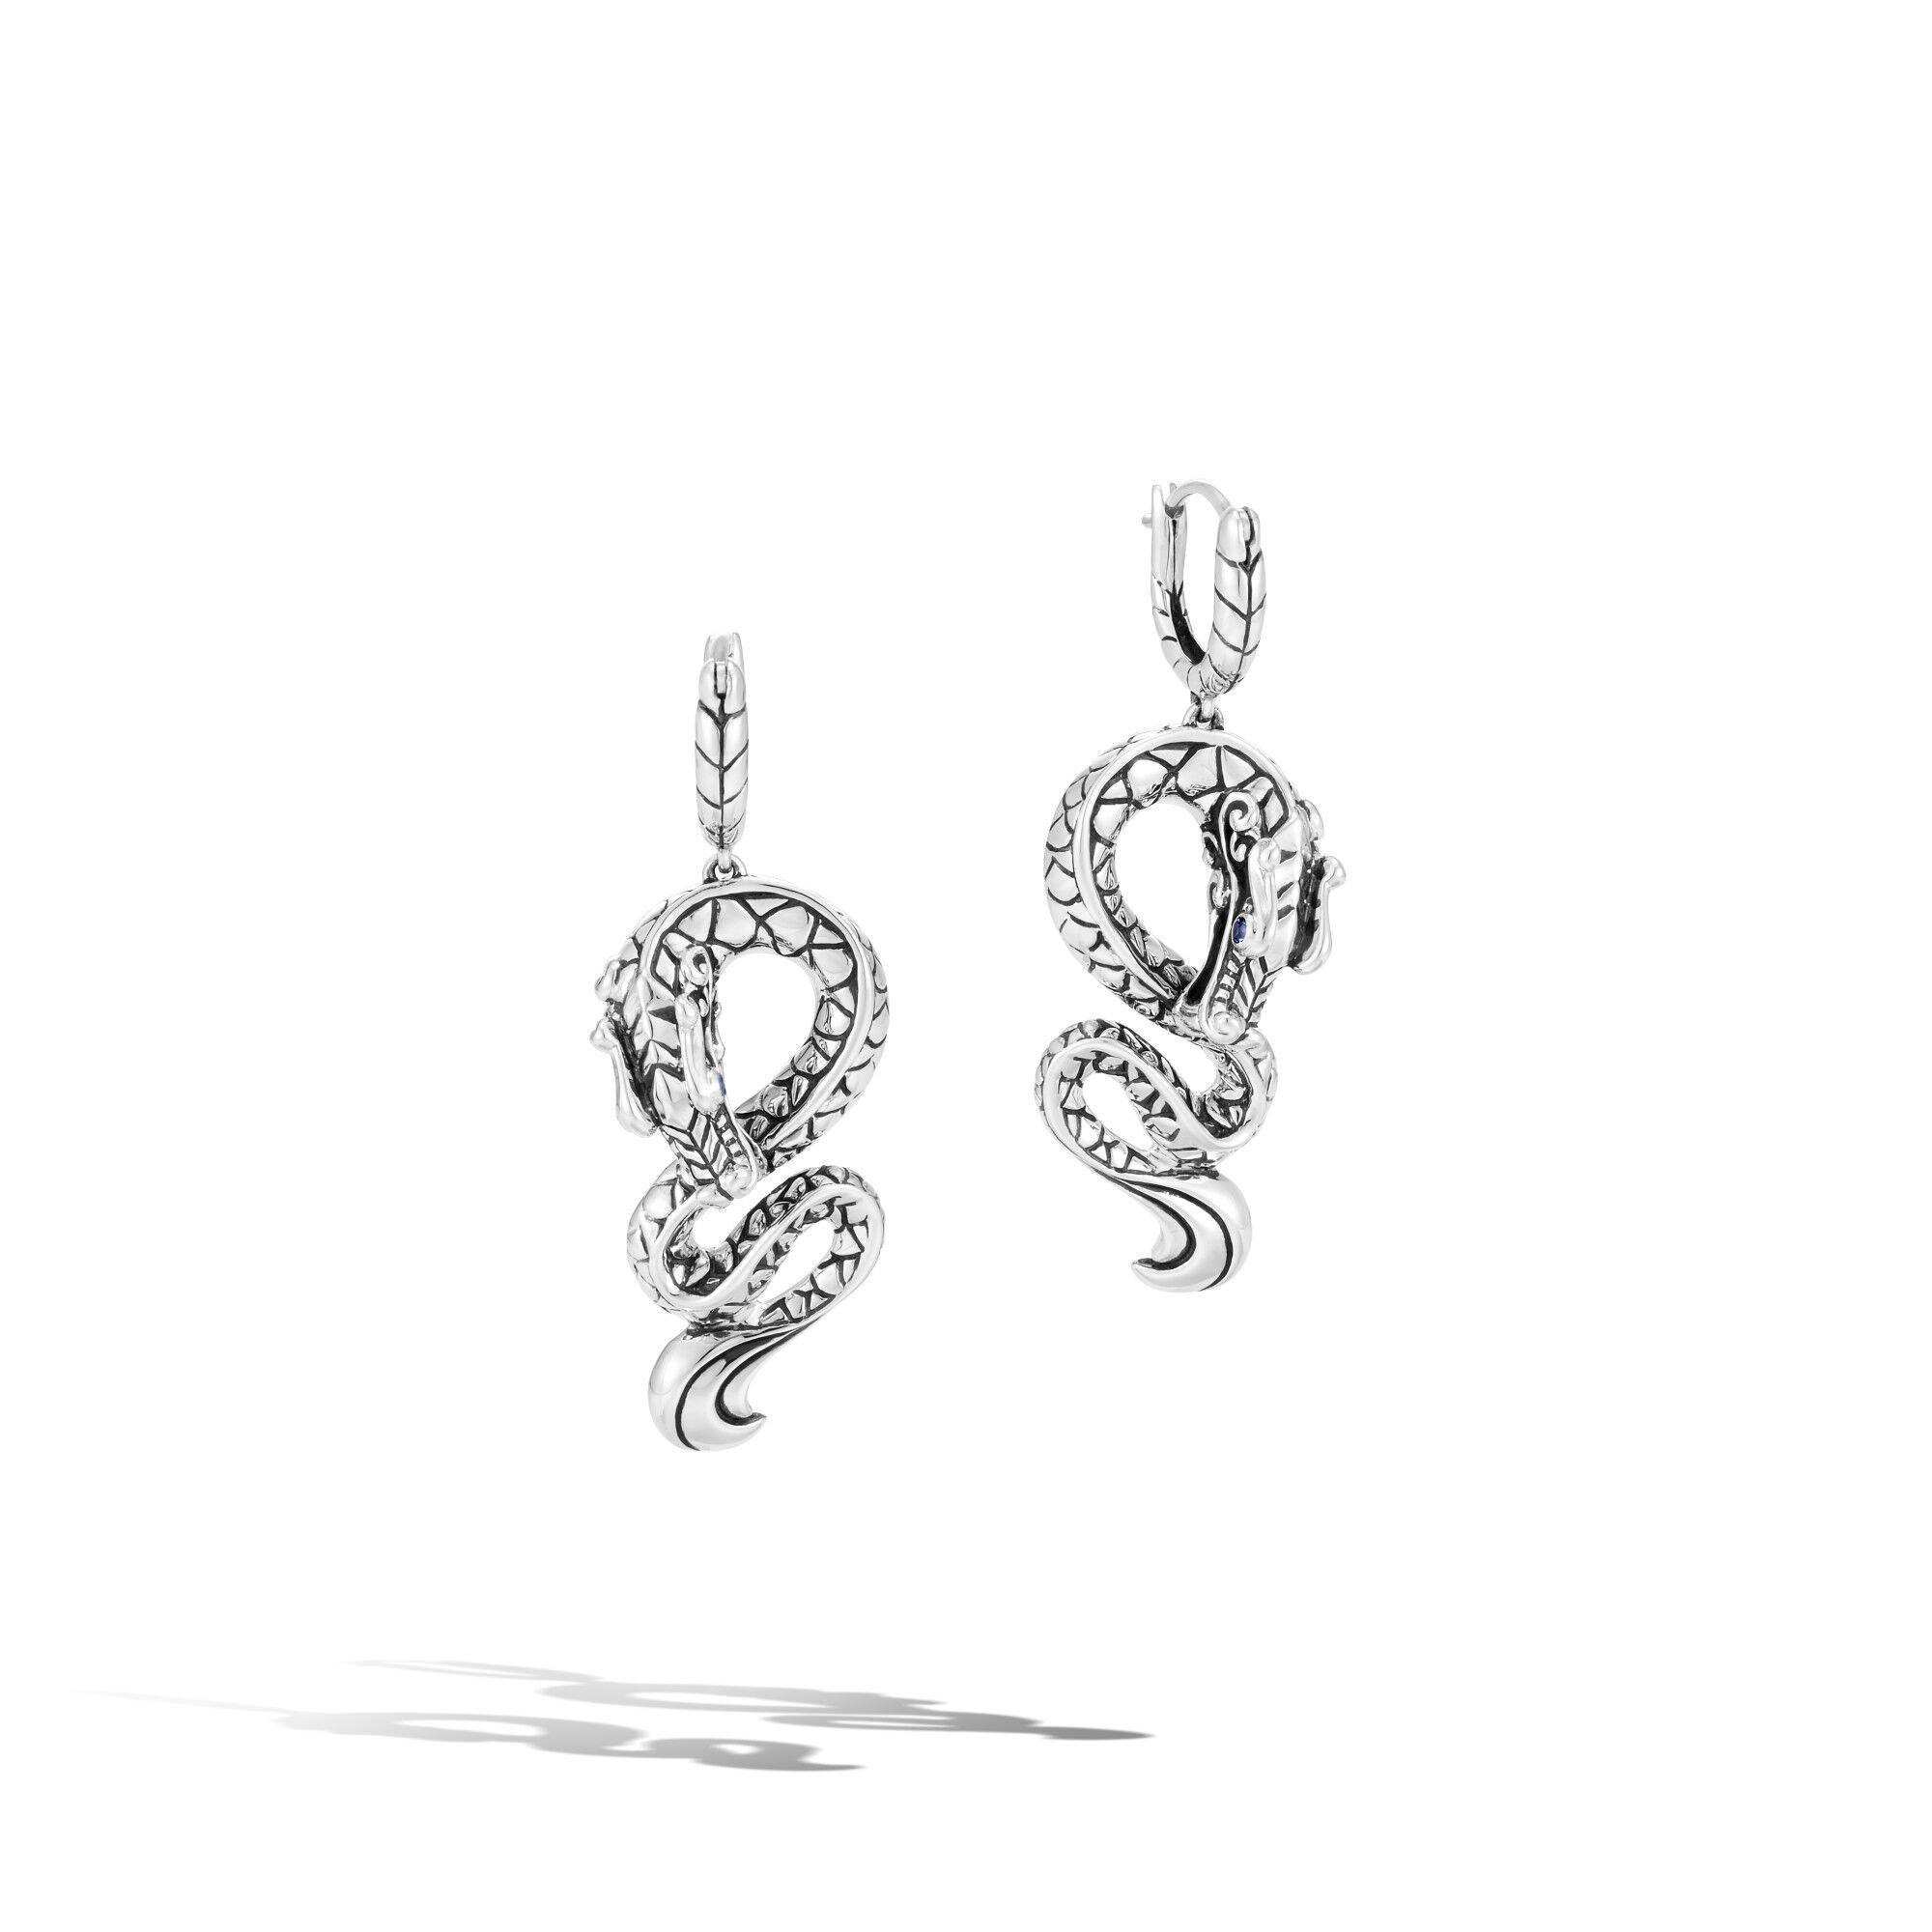 Legends Naga Drop Earrings in Silver, , large